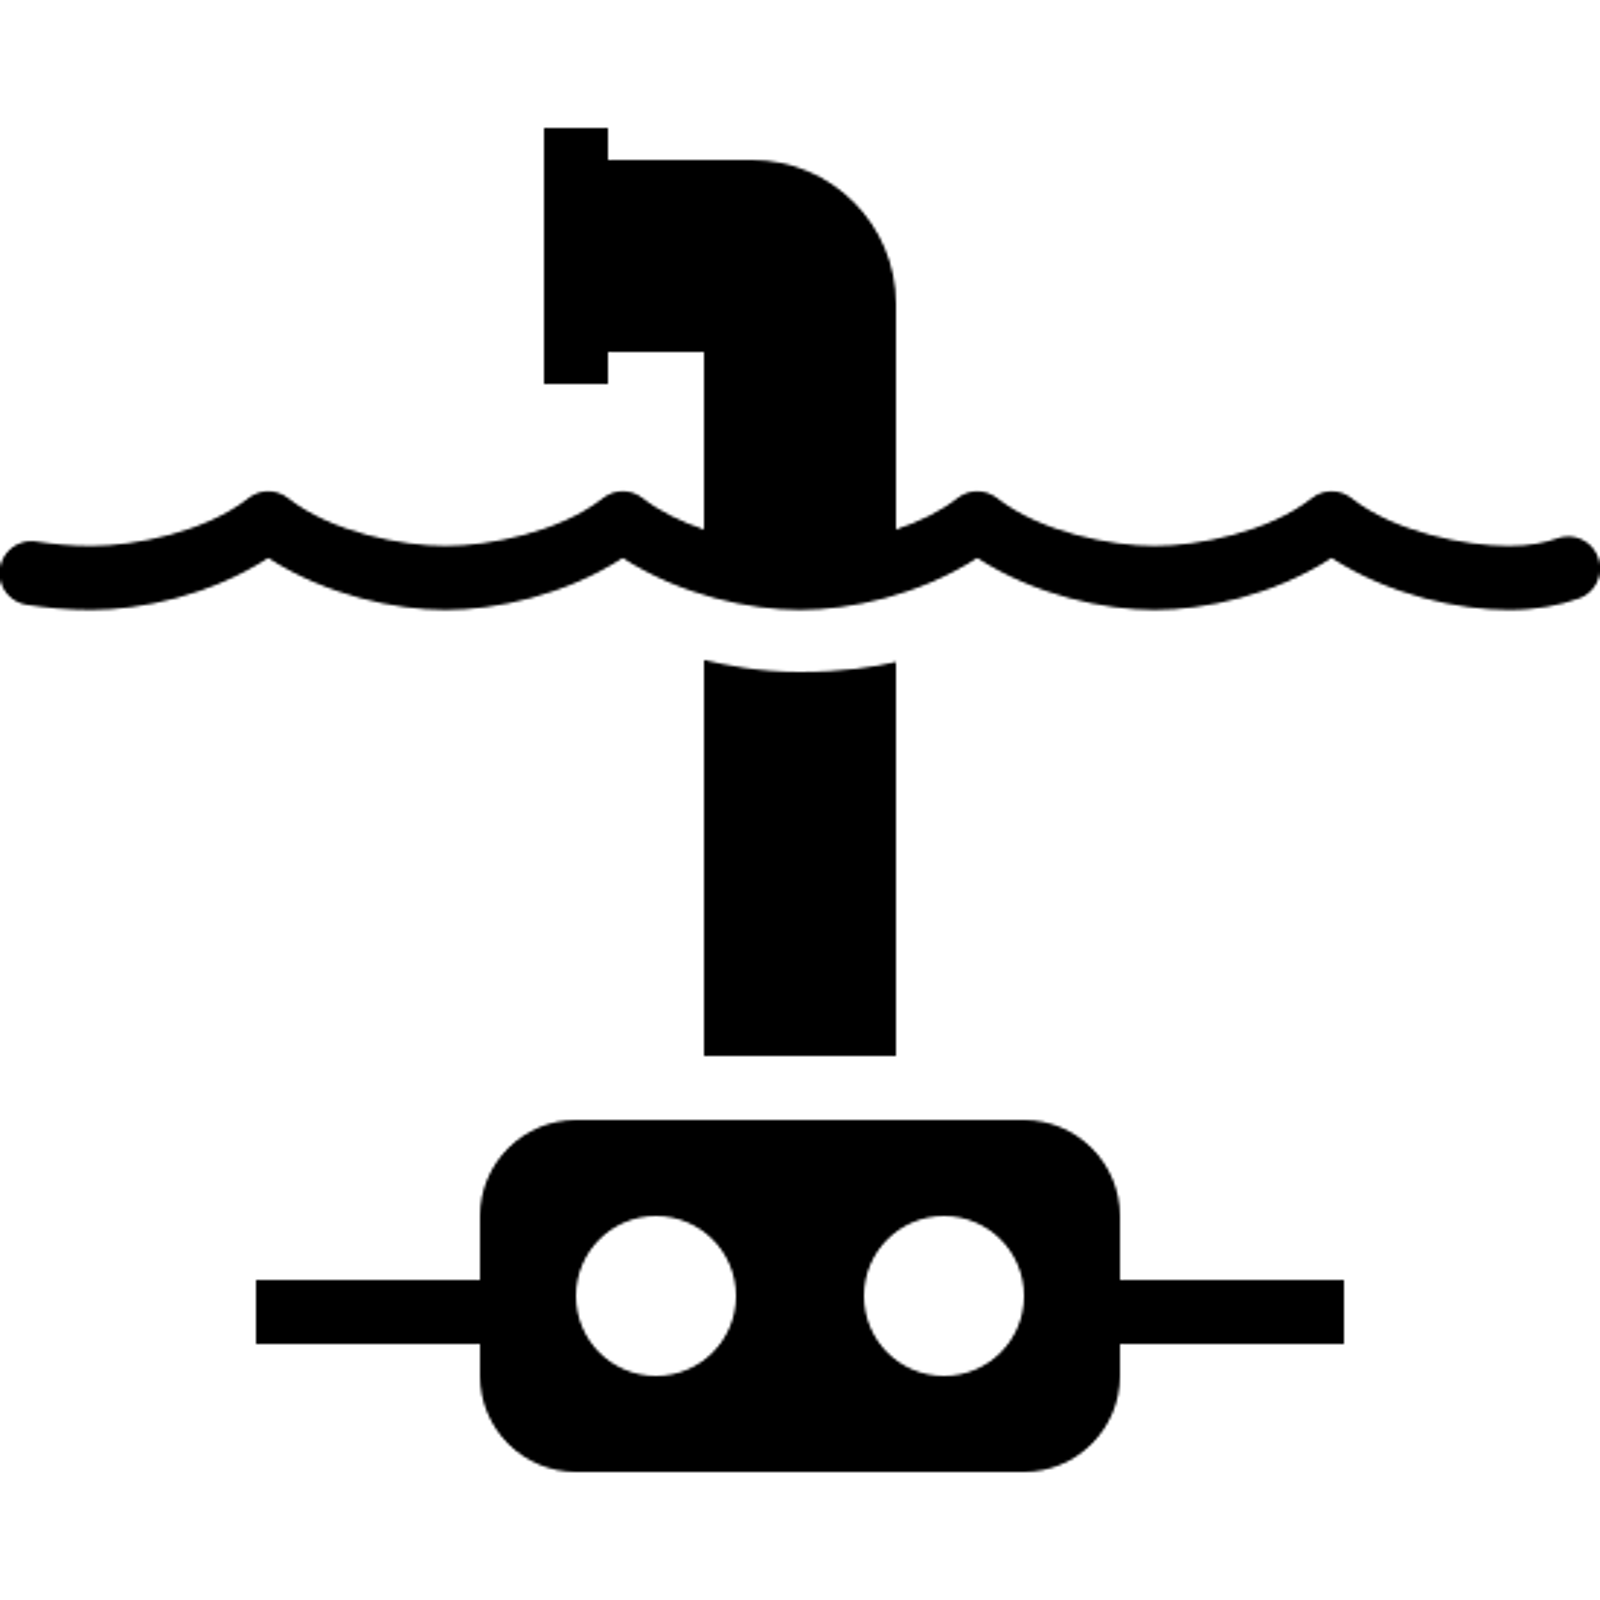 Periscope Filled icon